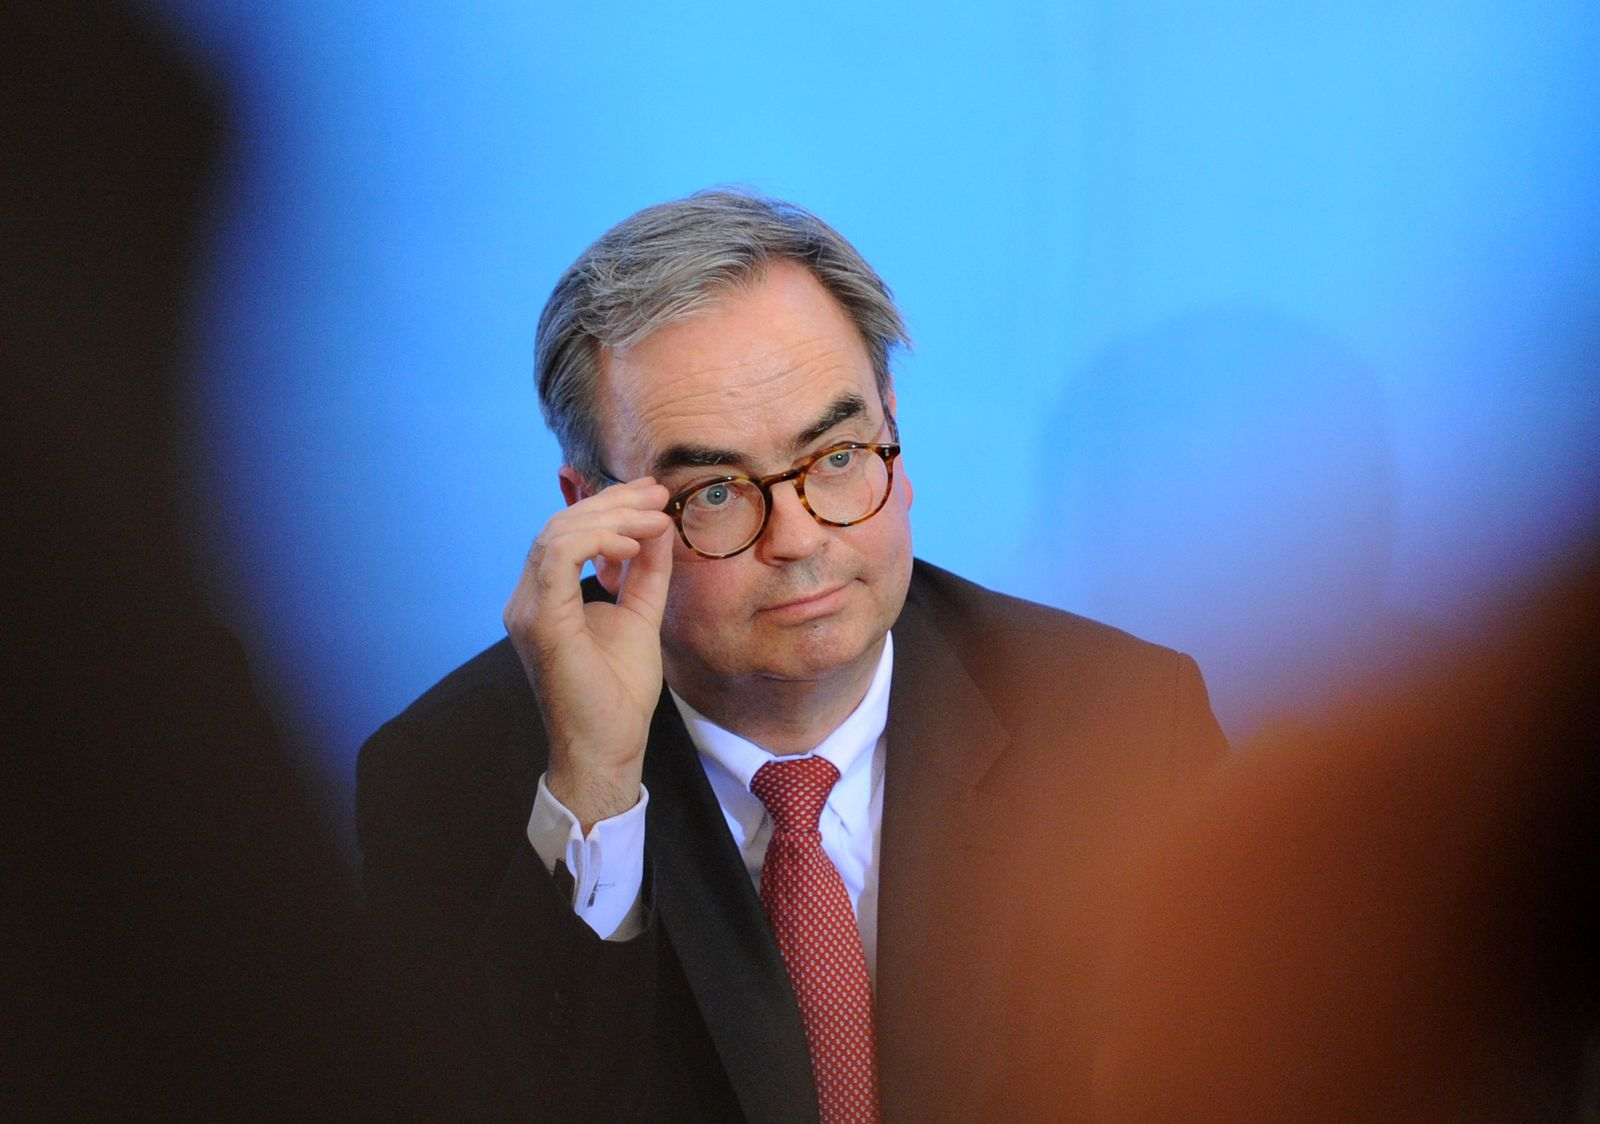 Walter Scheuerl